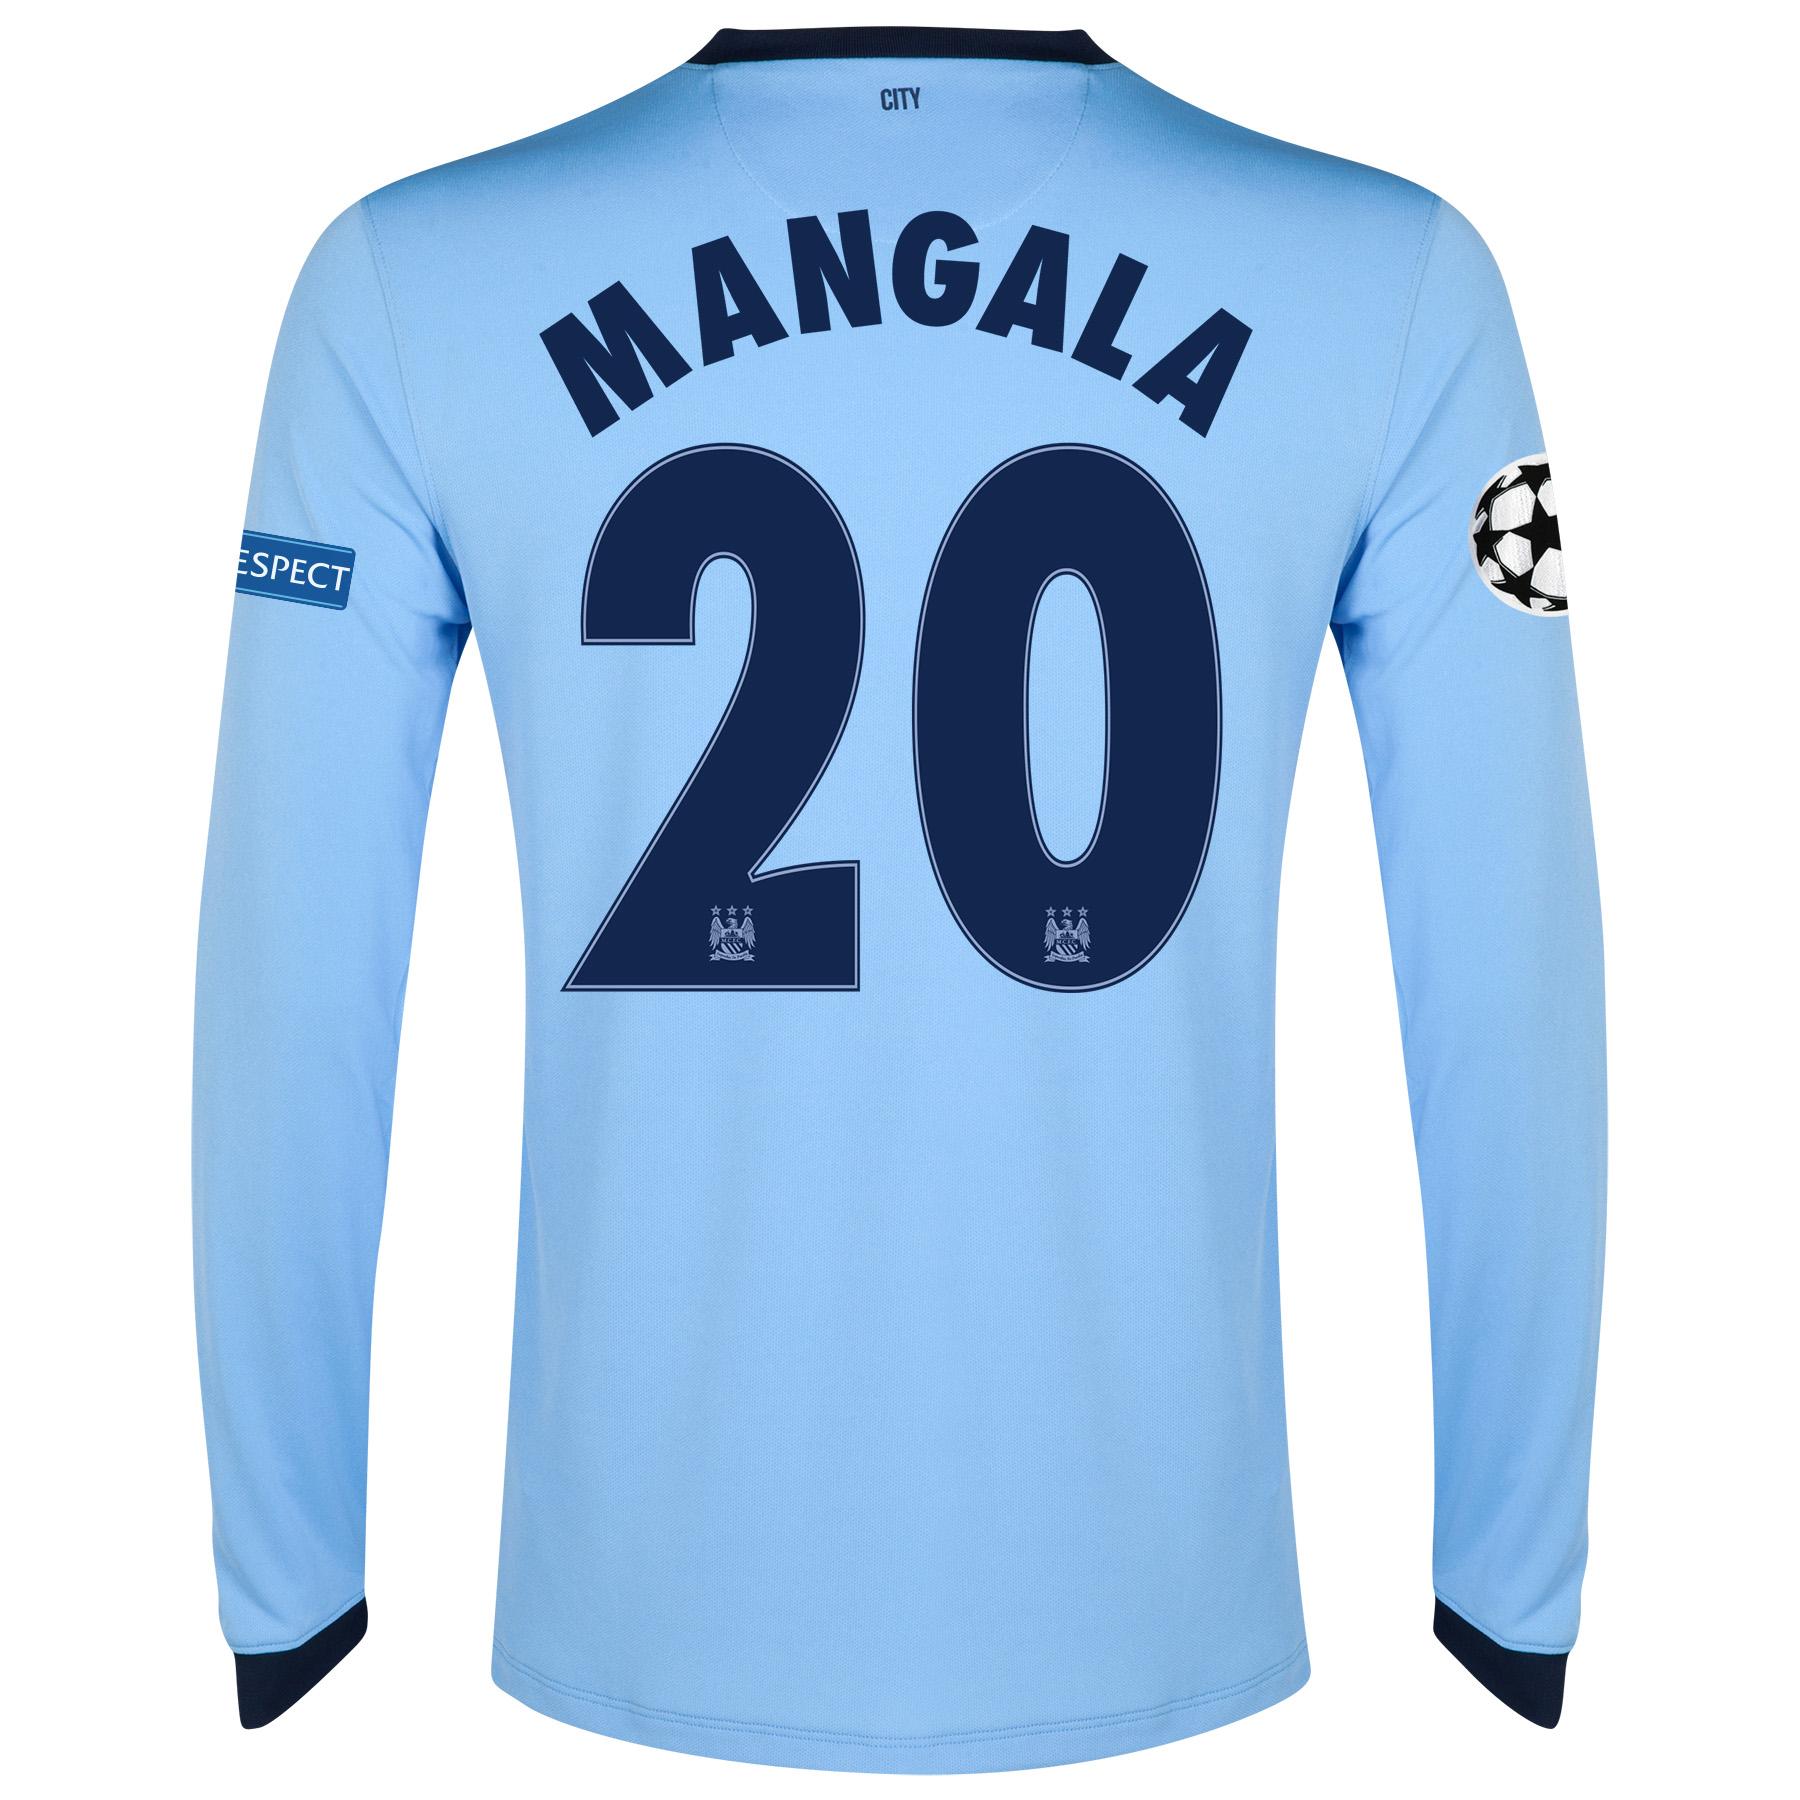 Manchester City UEFA Champions League Home Shirt 2014/15 - Long Sleeve - Kids Sky Blue with Mangala 20 printing